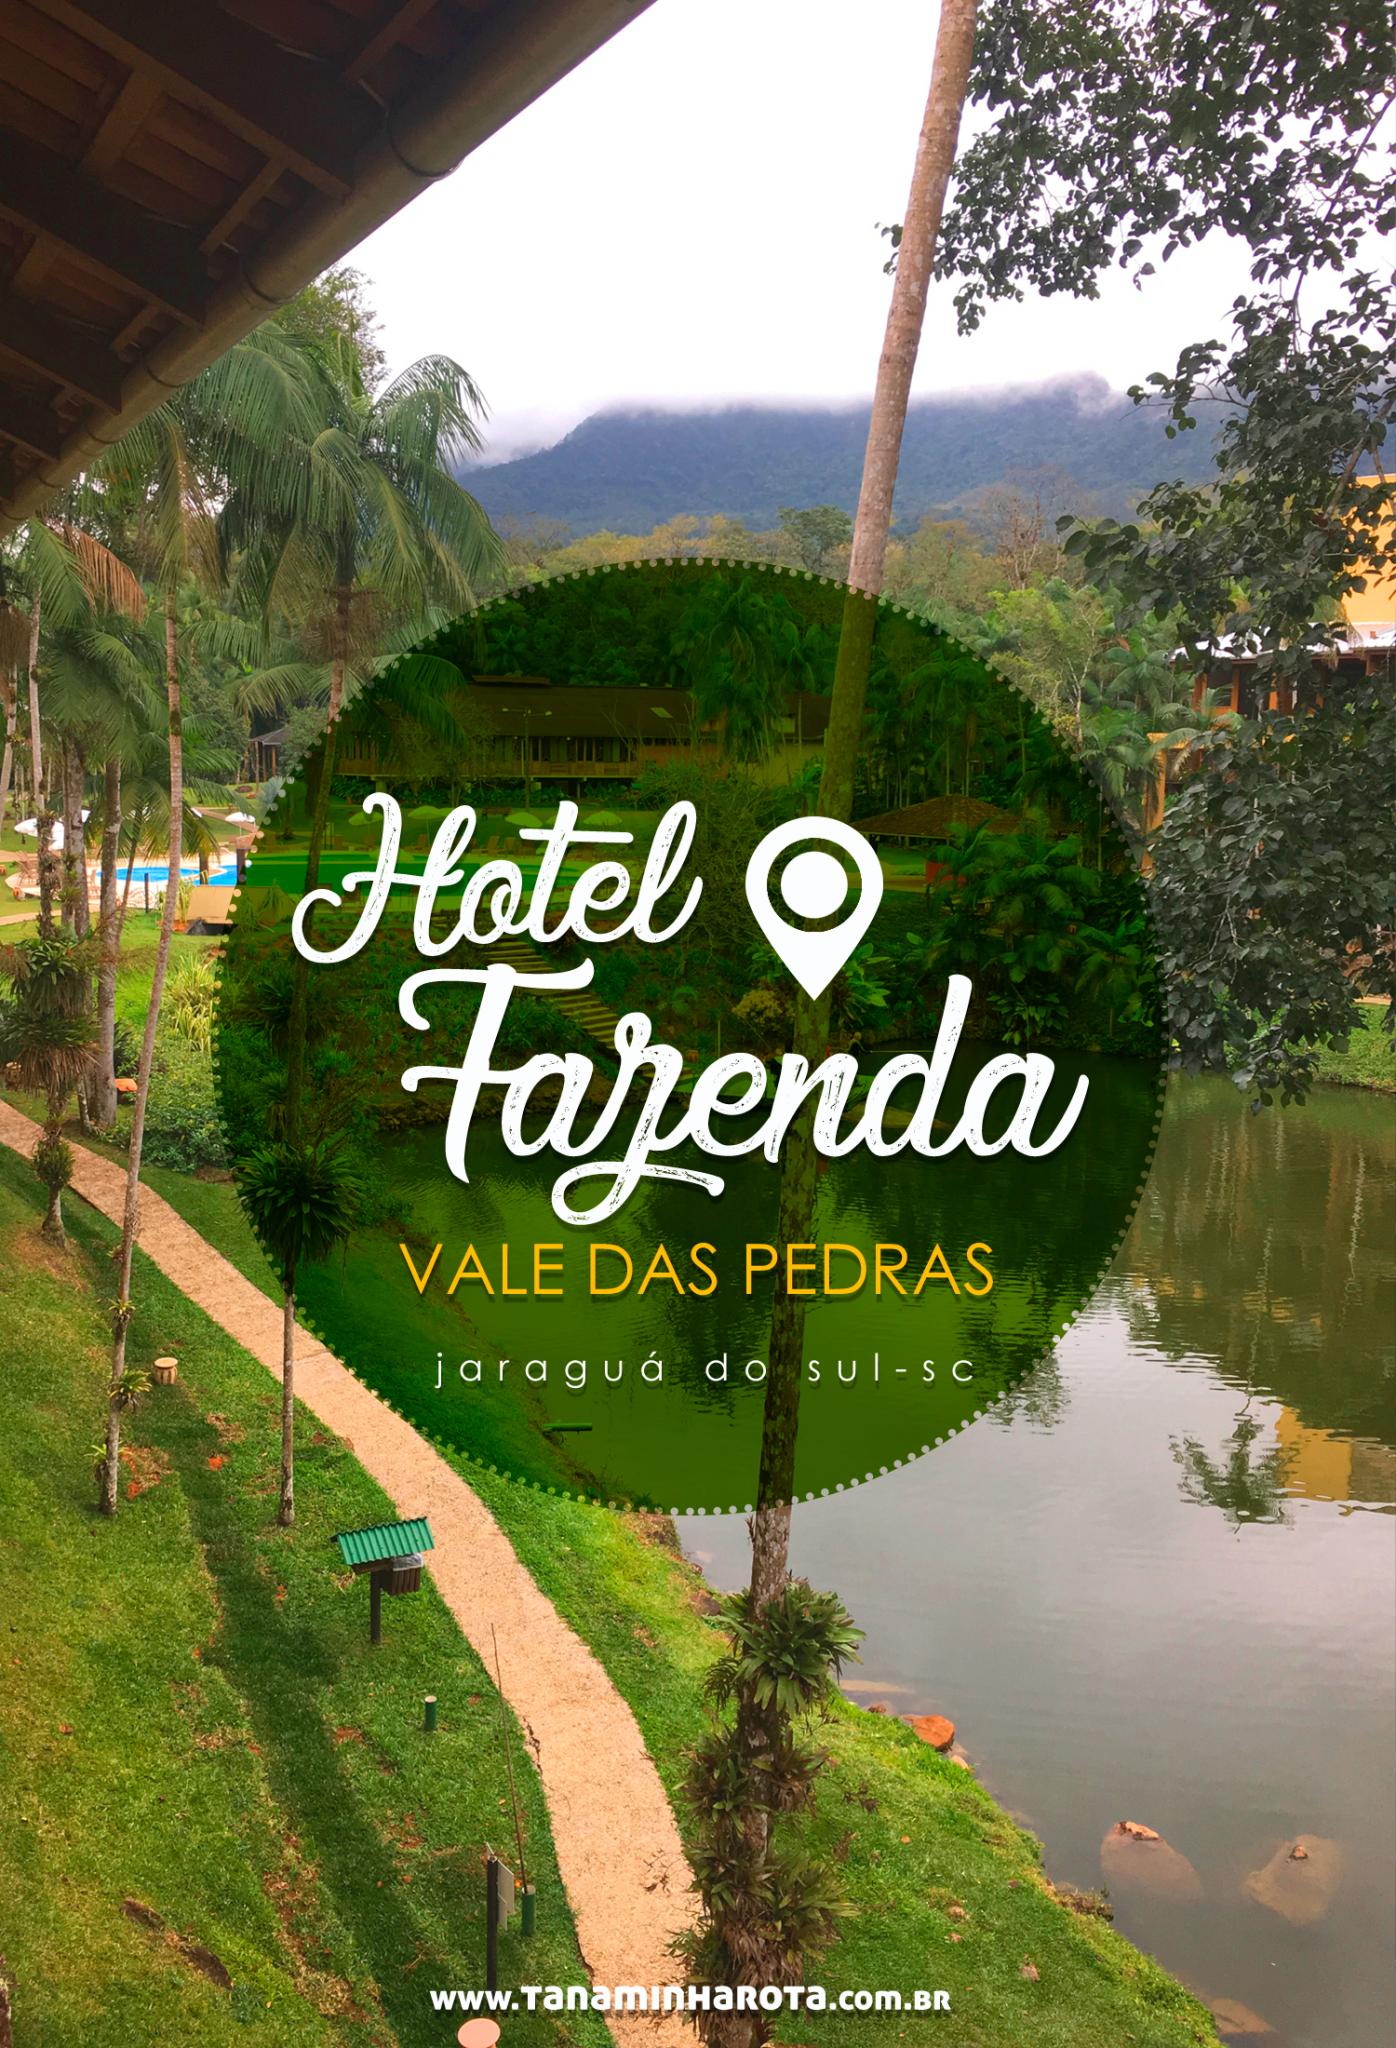 hotel-fazenda-em-santa-catarina-vale-das-pedras-jaragua-do-sul